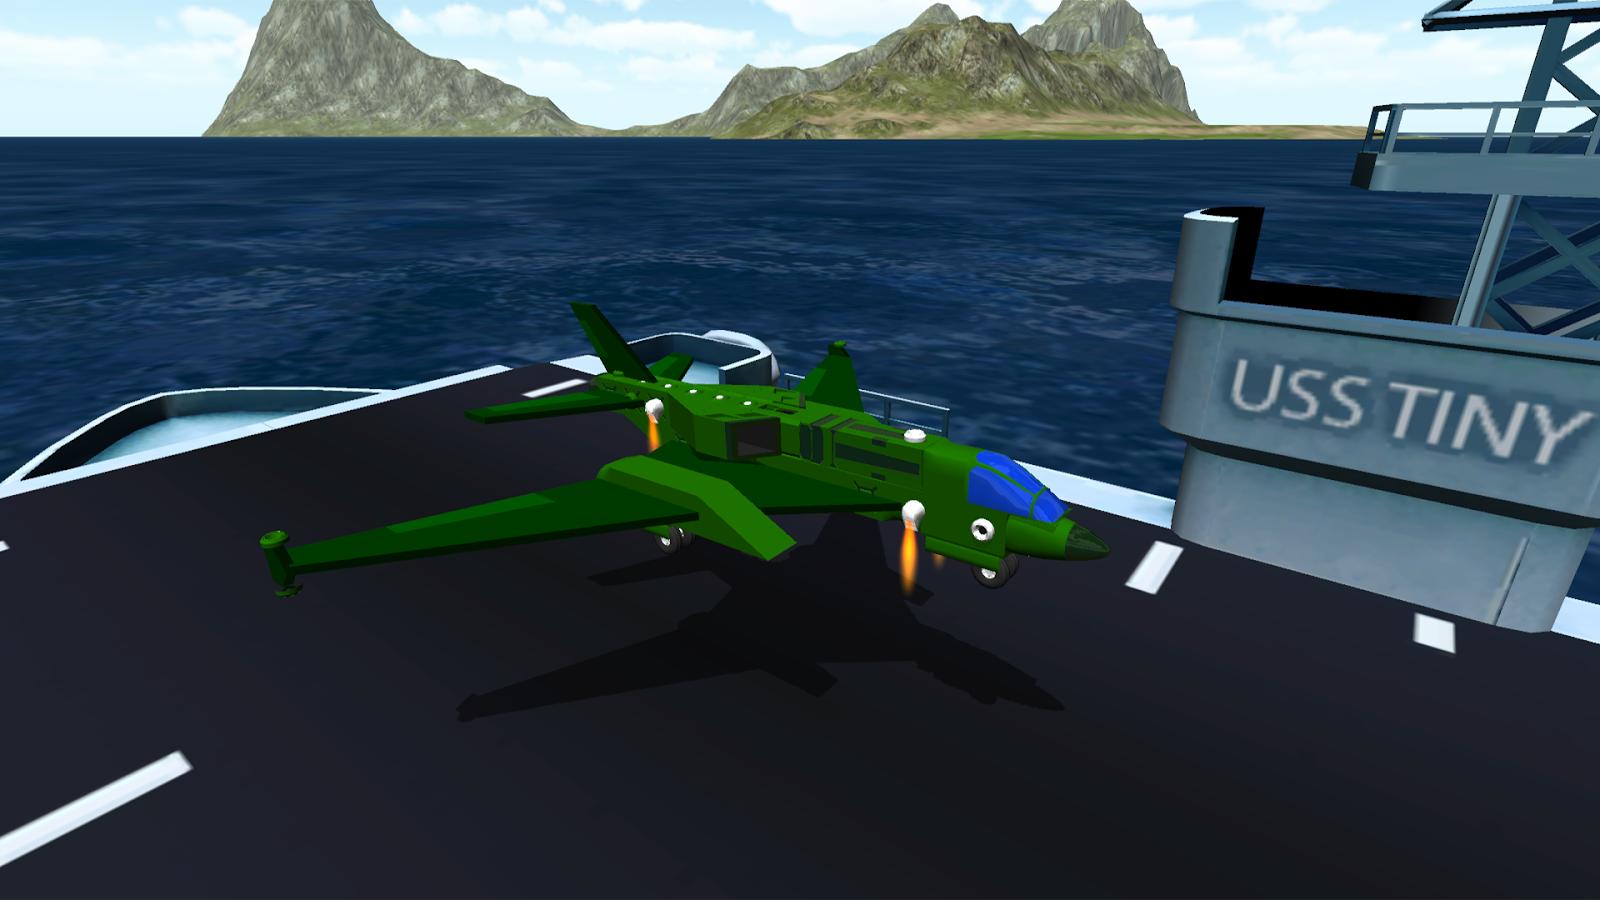 Самолет - SimplePlanes для Android